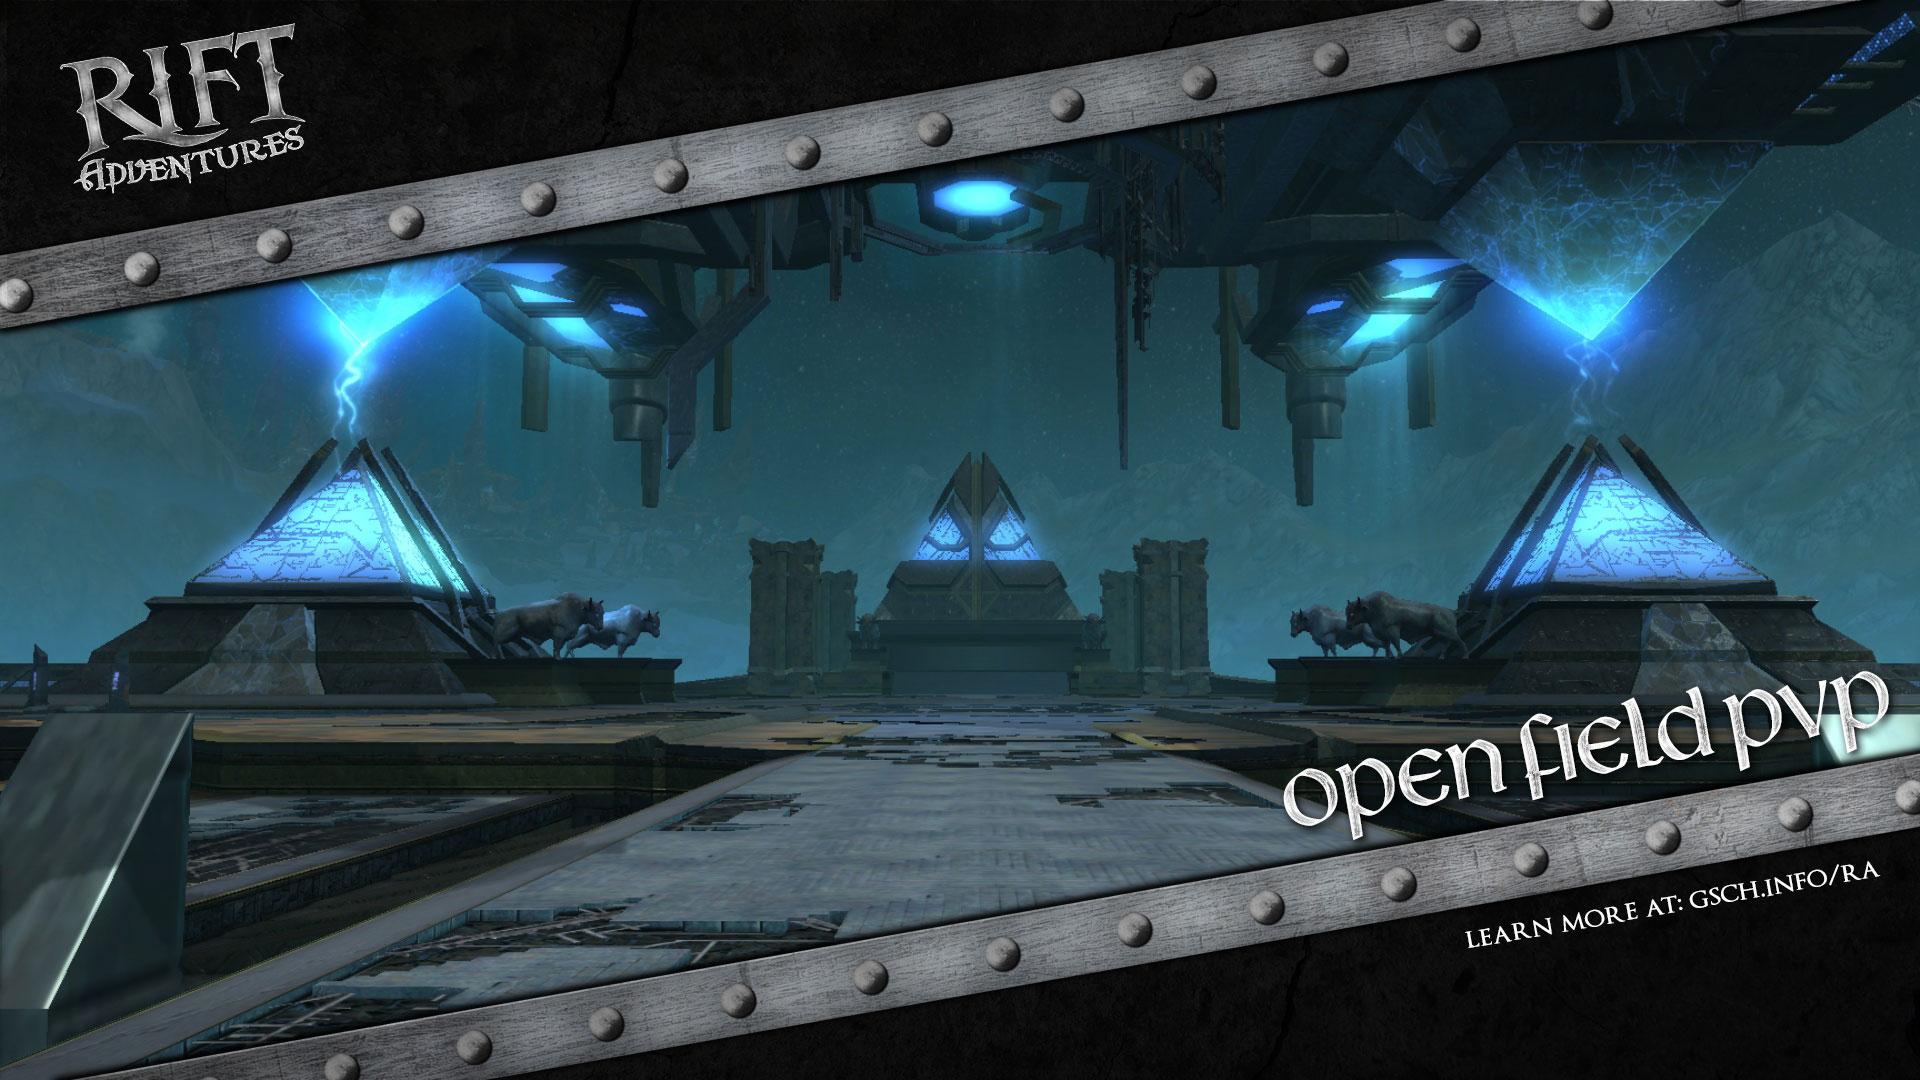 Episode 19: Open PvP - Rift Adventures